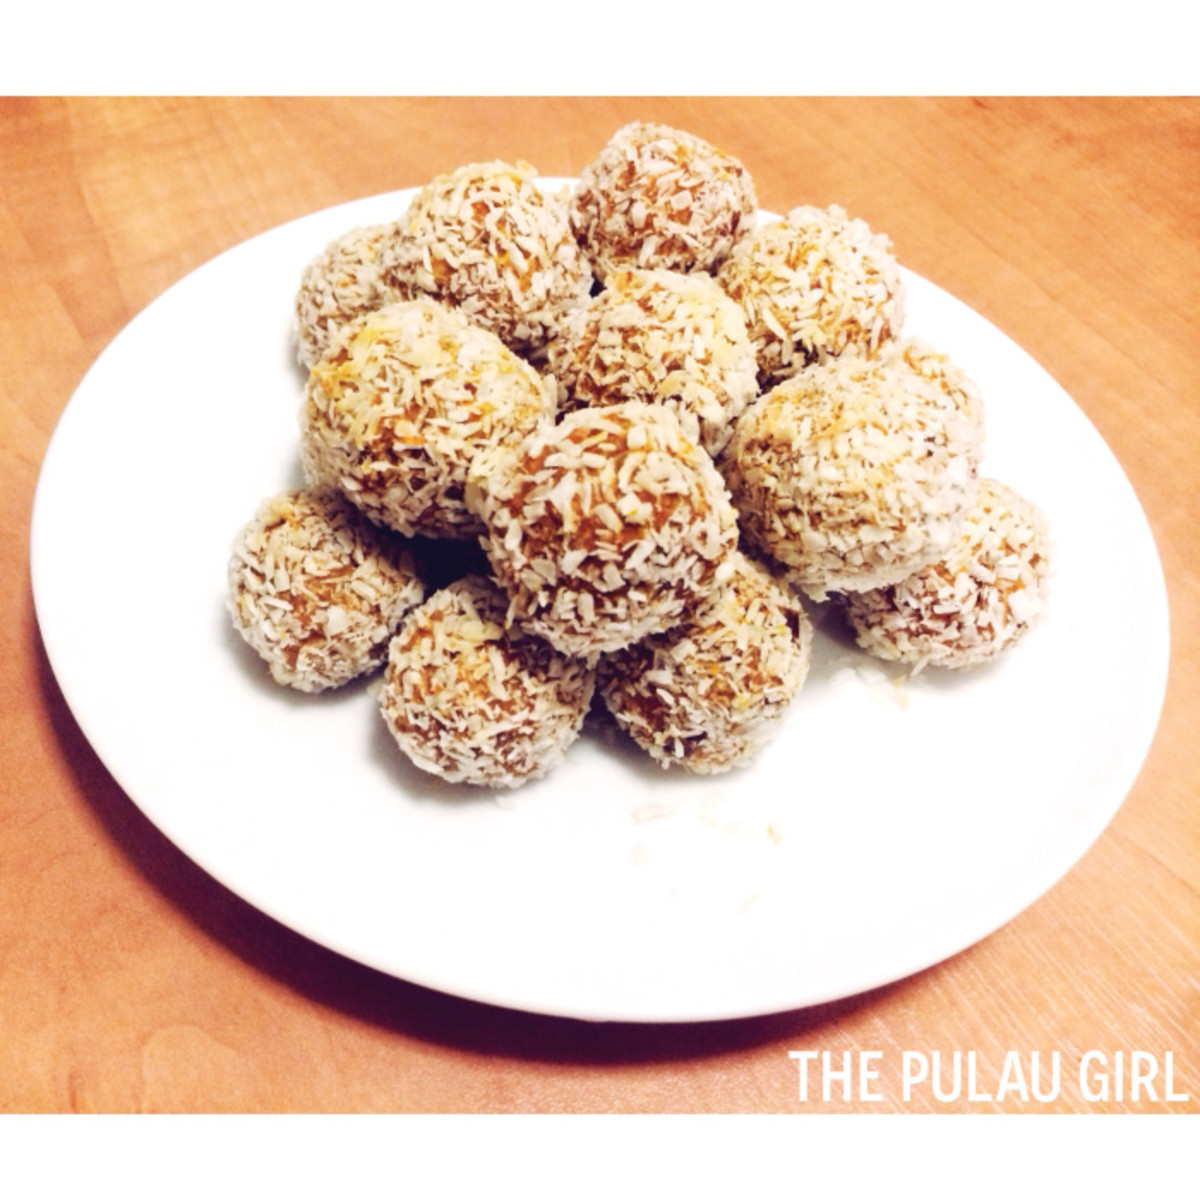 Sweet potato coconut balls are yummy.